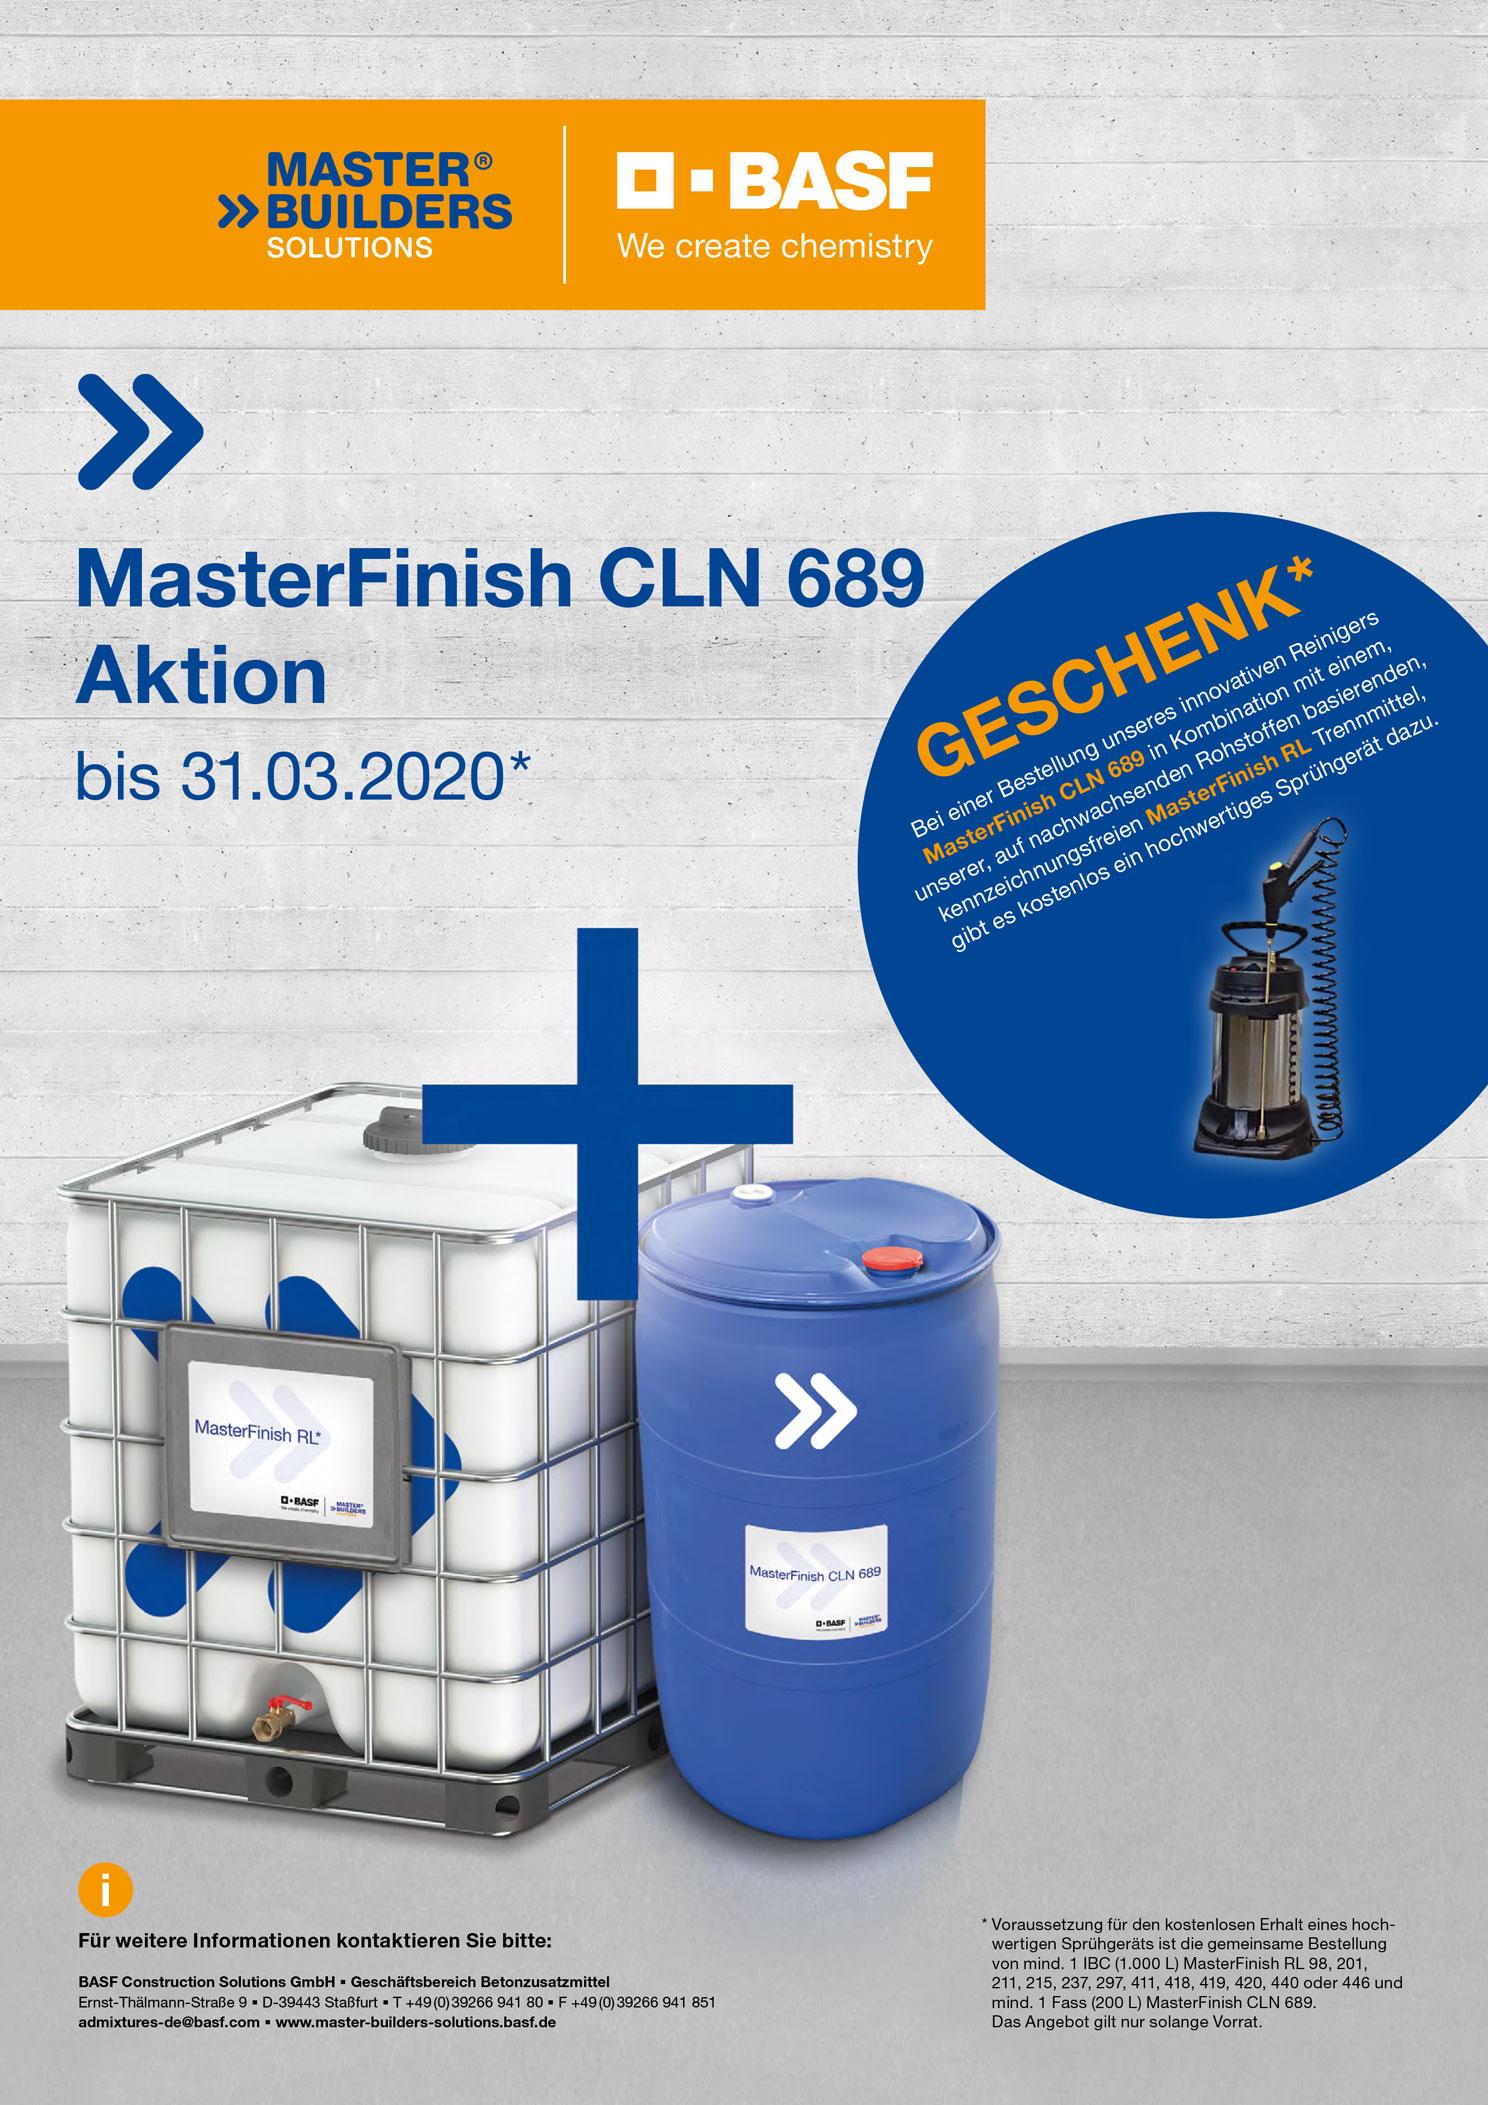 MasterFinish CLN 689 Aktion